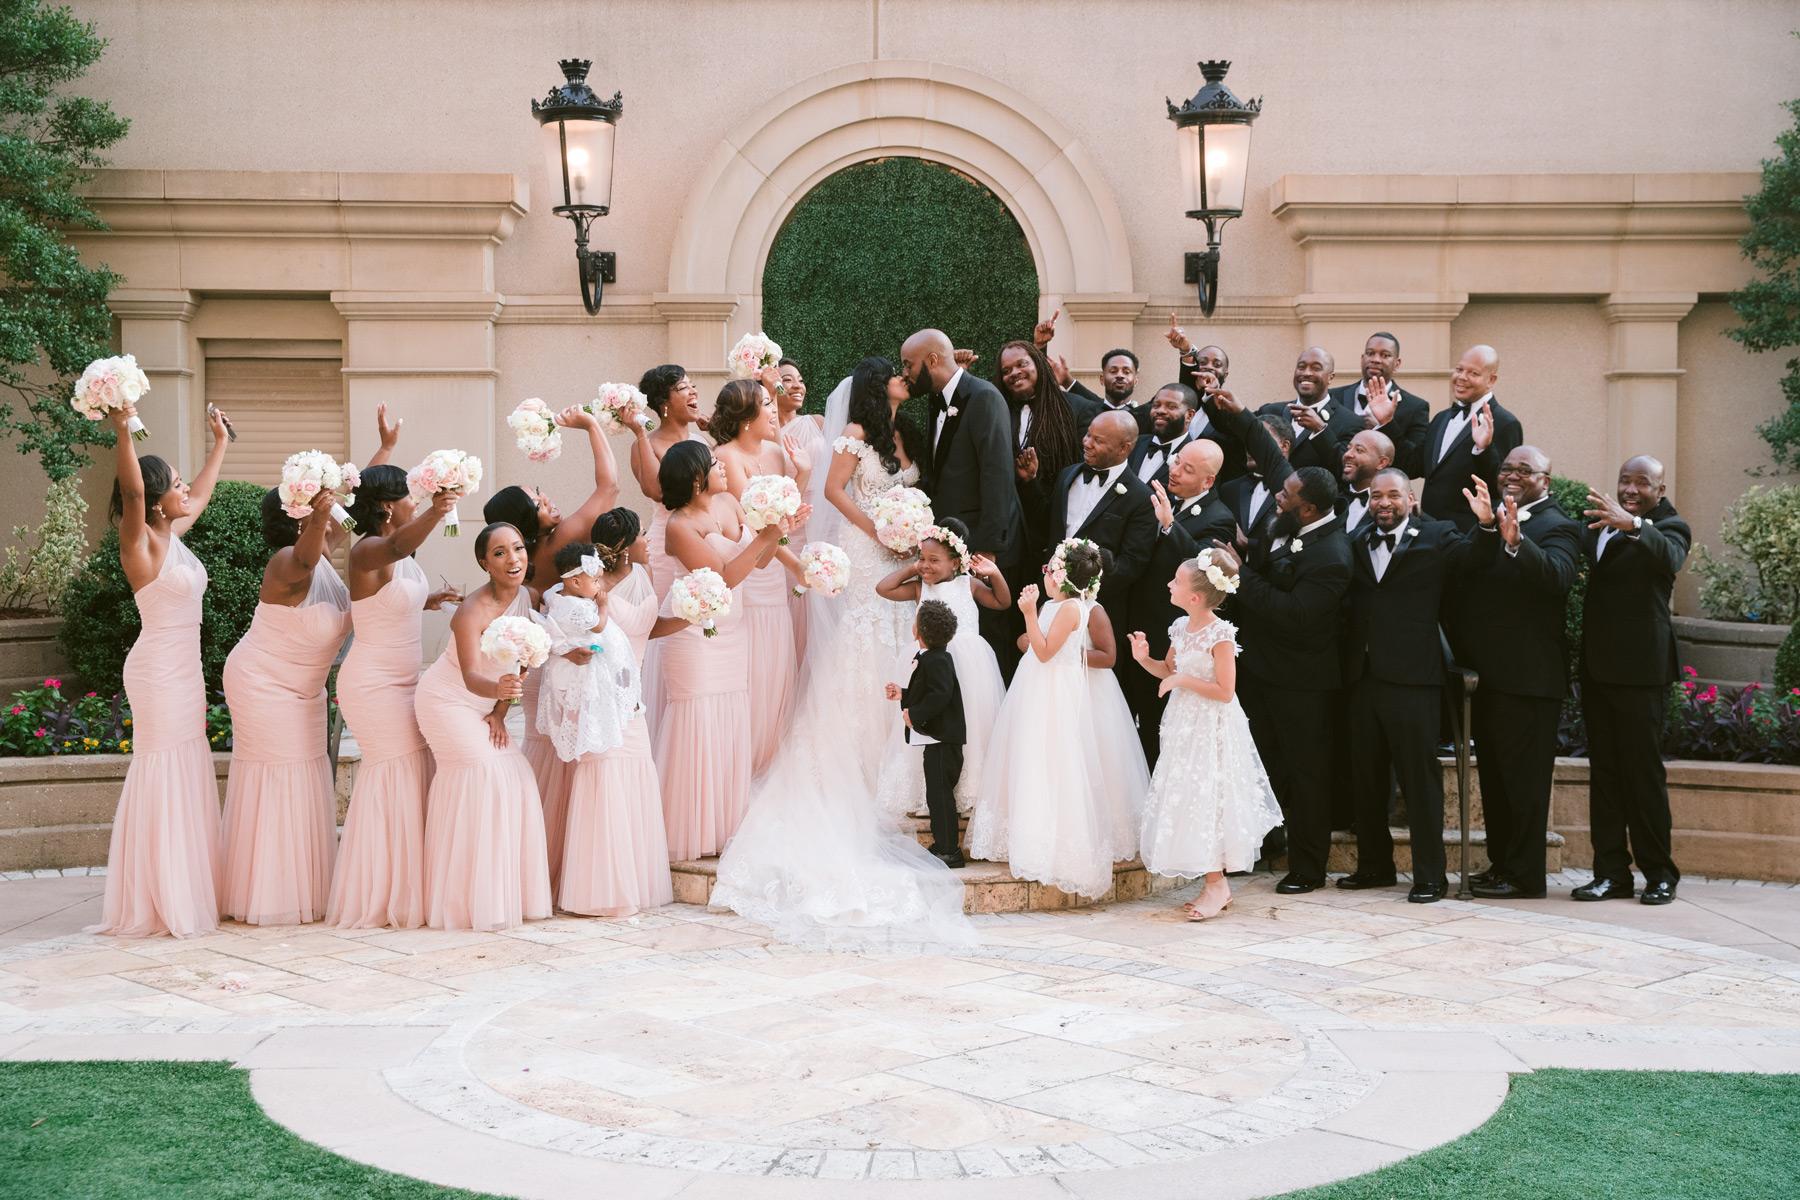 St-Regis-Wedding-Atlanta-0914-0057